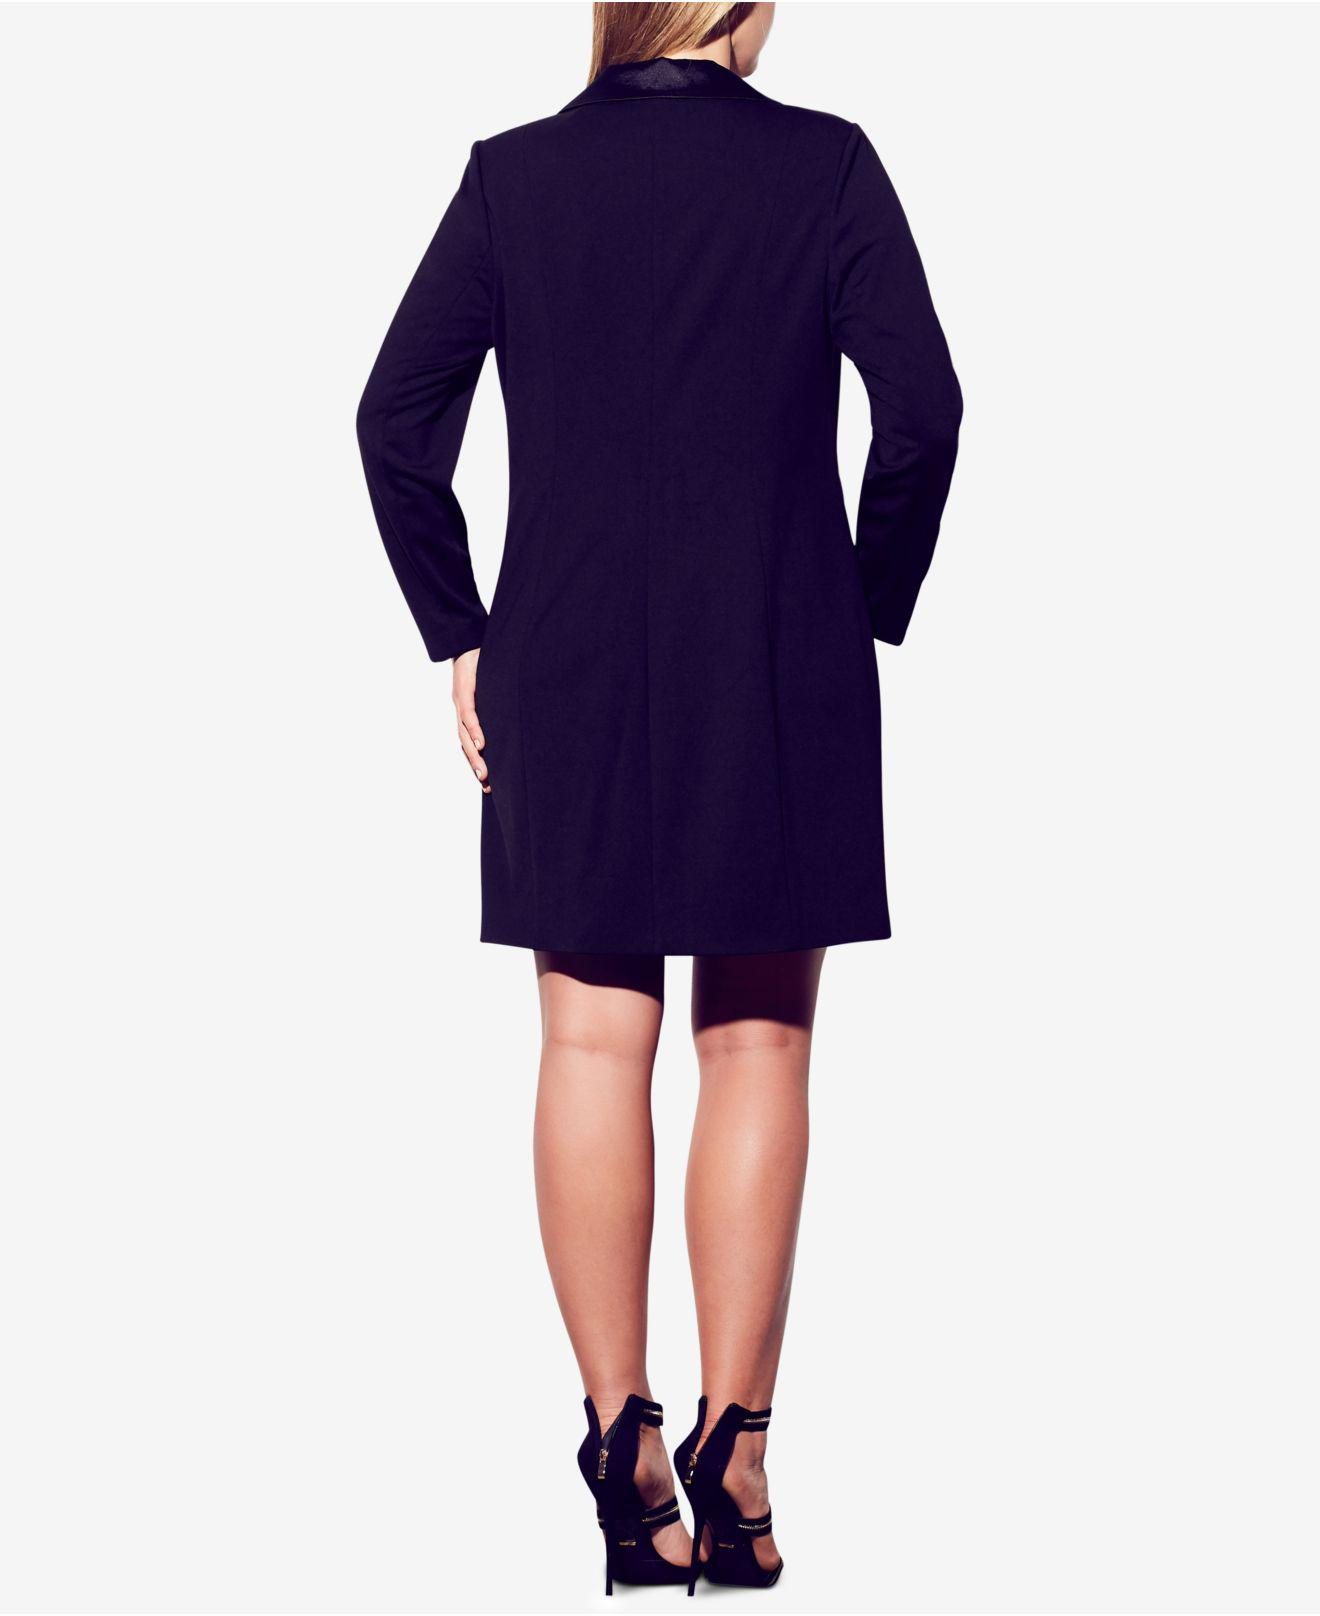 Trendy Plus Size Double-breasted Tuxedo Dress